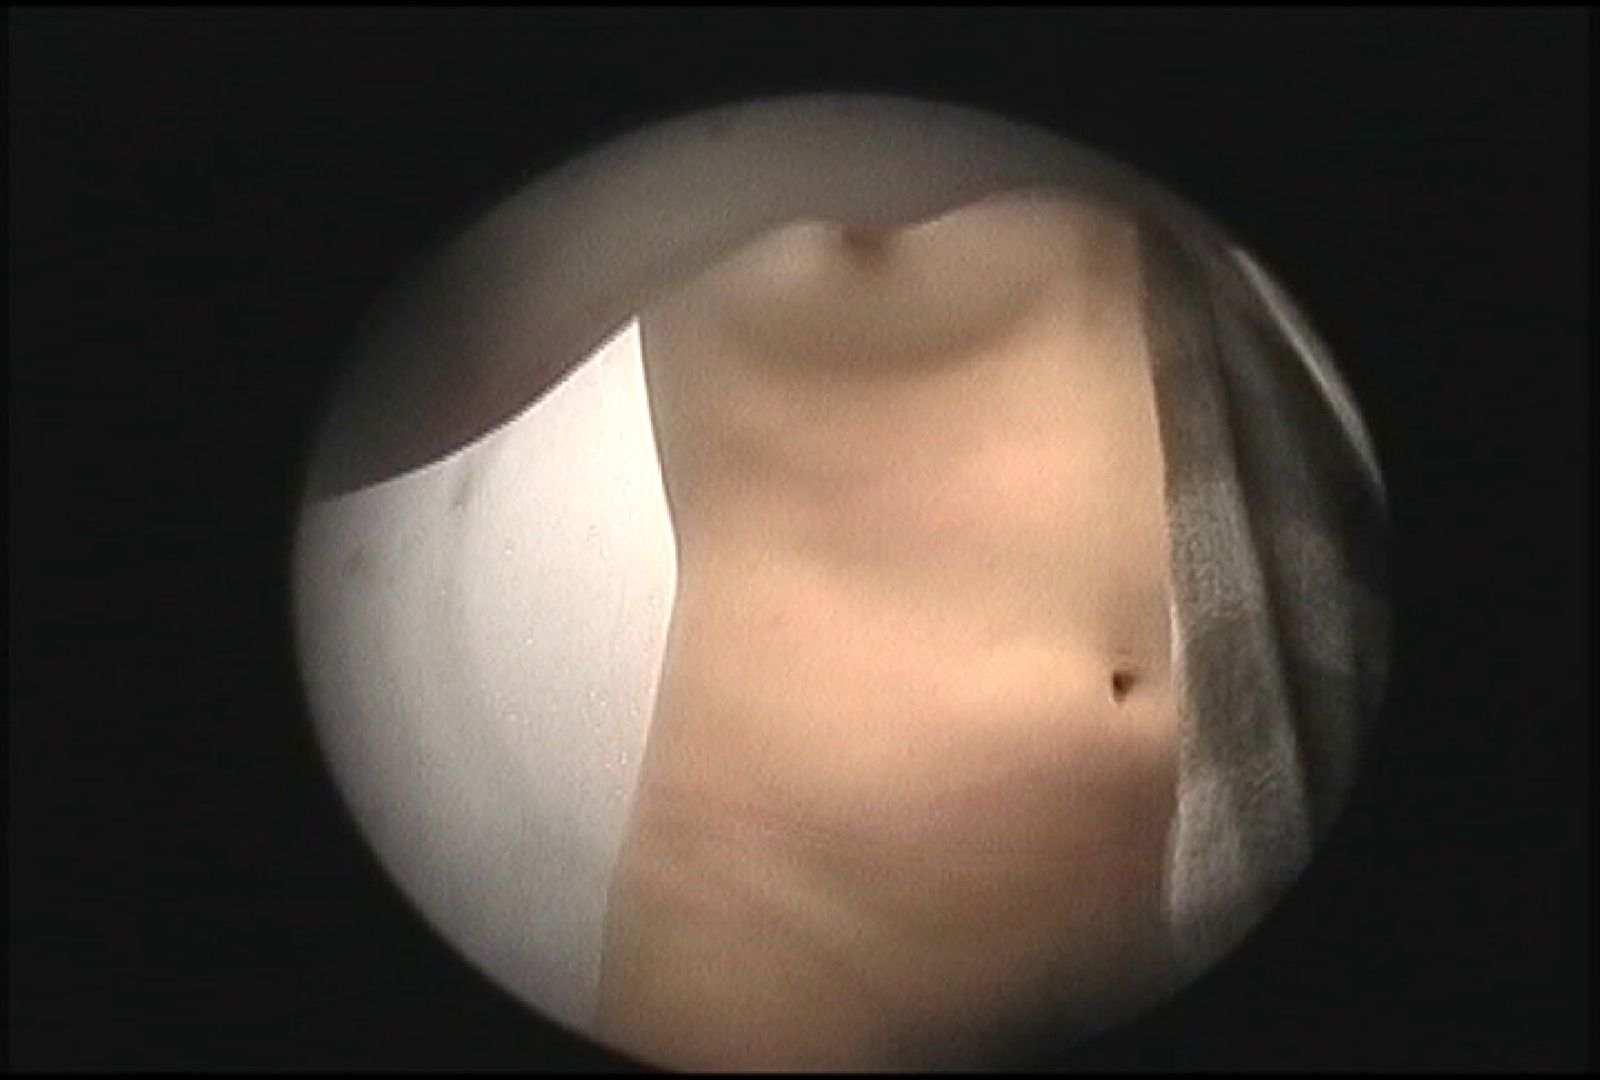 No.126 砂まみれ陥没乳首 細身・スレンダー エロ画像 71画像 65